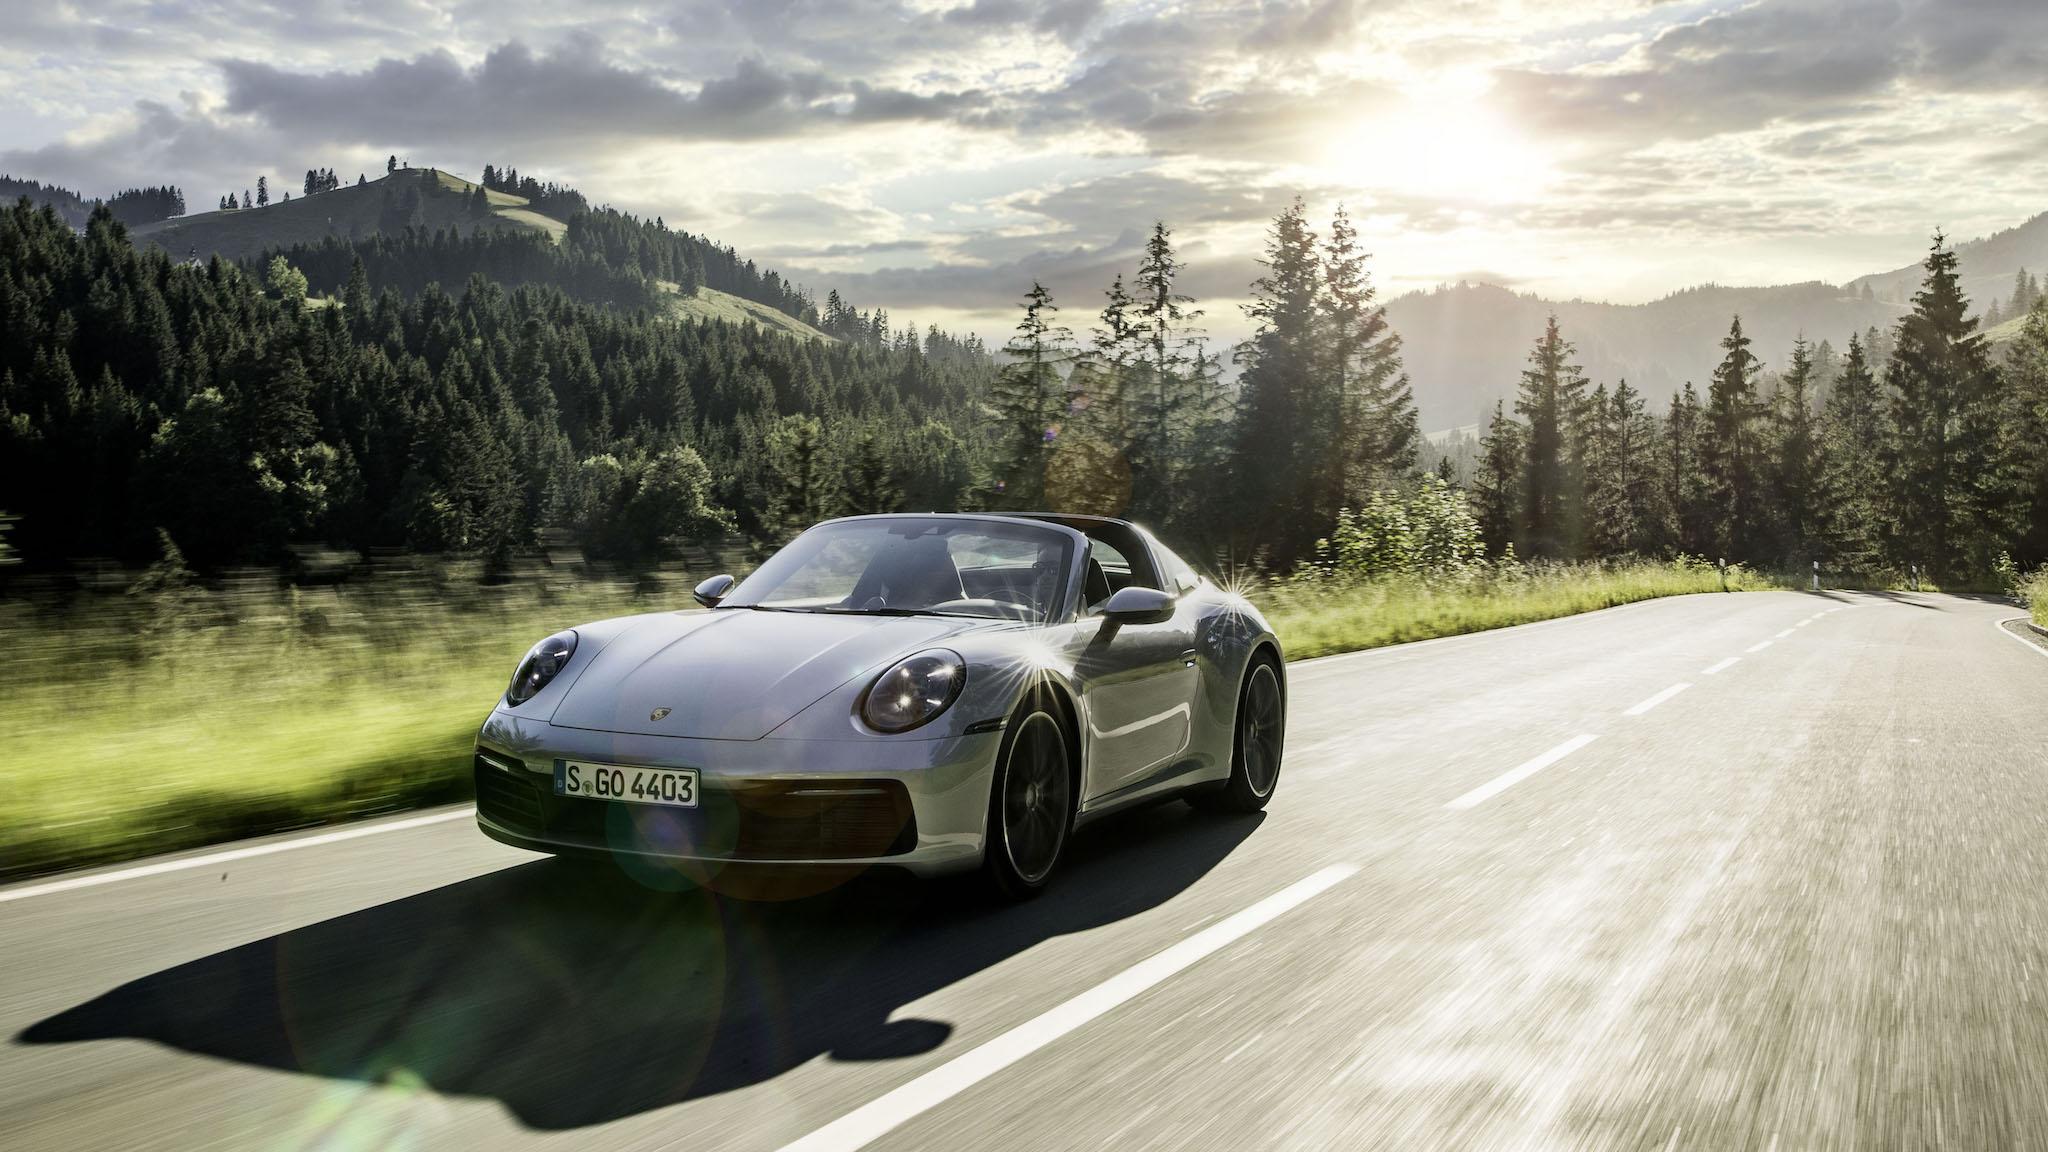 Porsche上半年台灣逆勢成長,Taycan 全球繳出逾 4,000 台